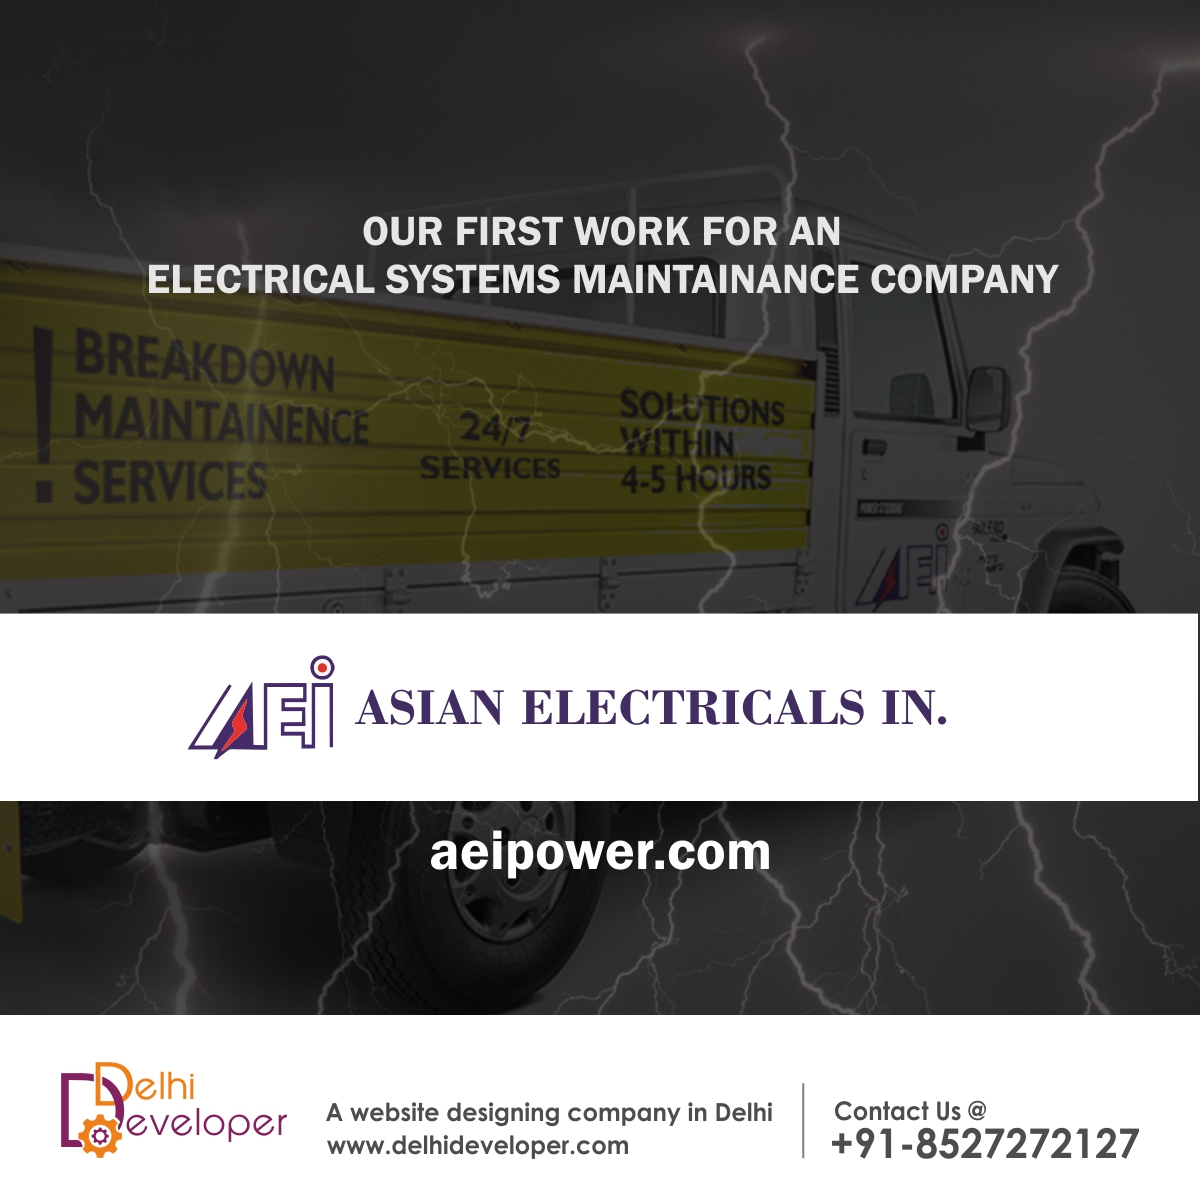 Launching AEIPower.com » Delhi Developer